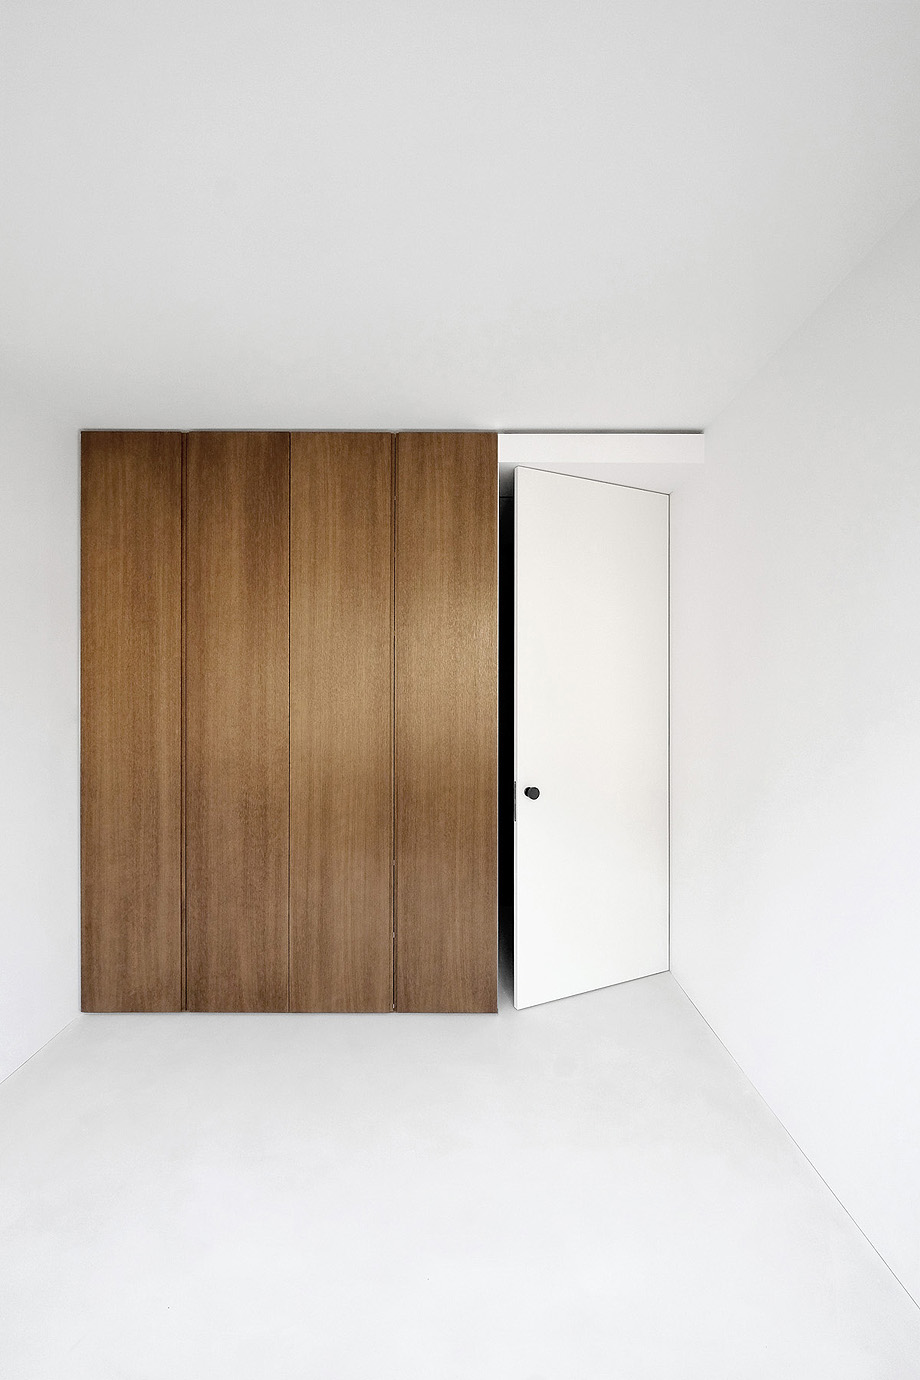 apartamento p-420 de nicolas dorval-bory - foto nicolas dorval-bory (12)